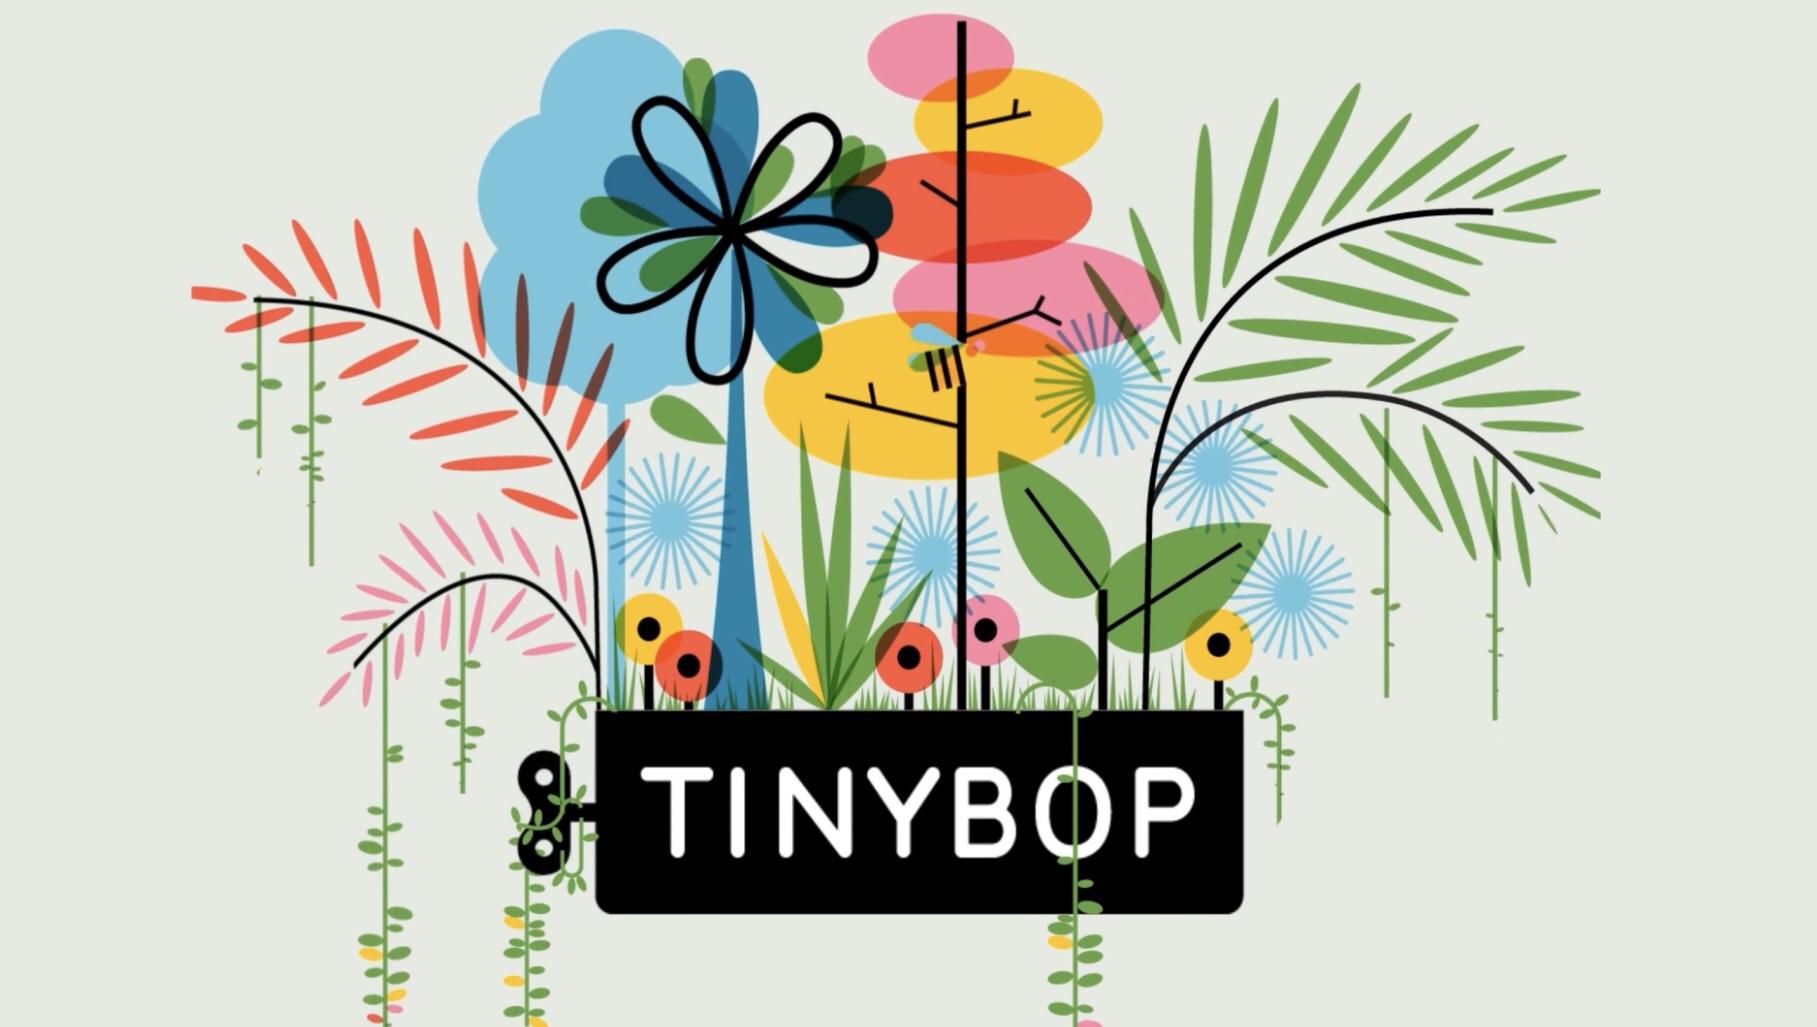 Tinybopin kasvit